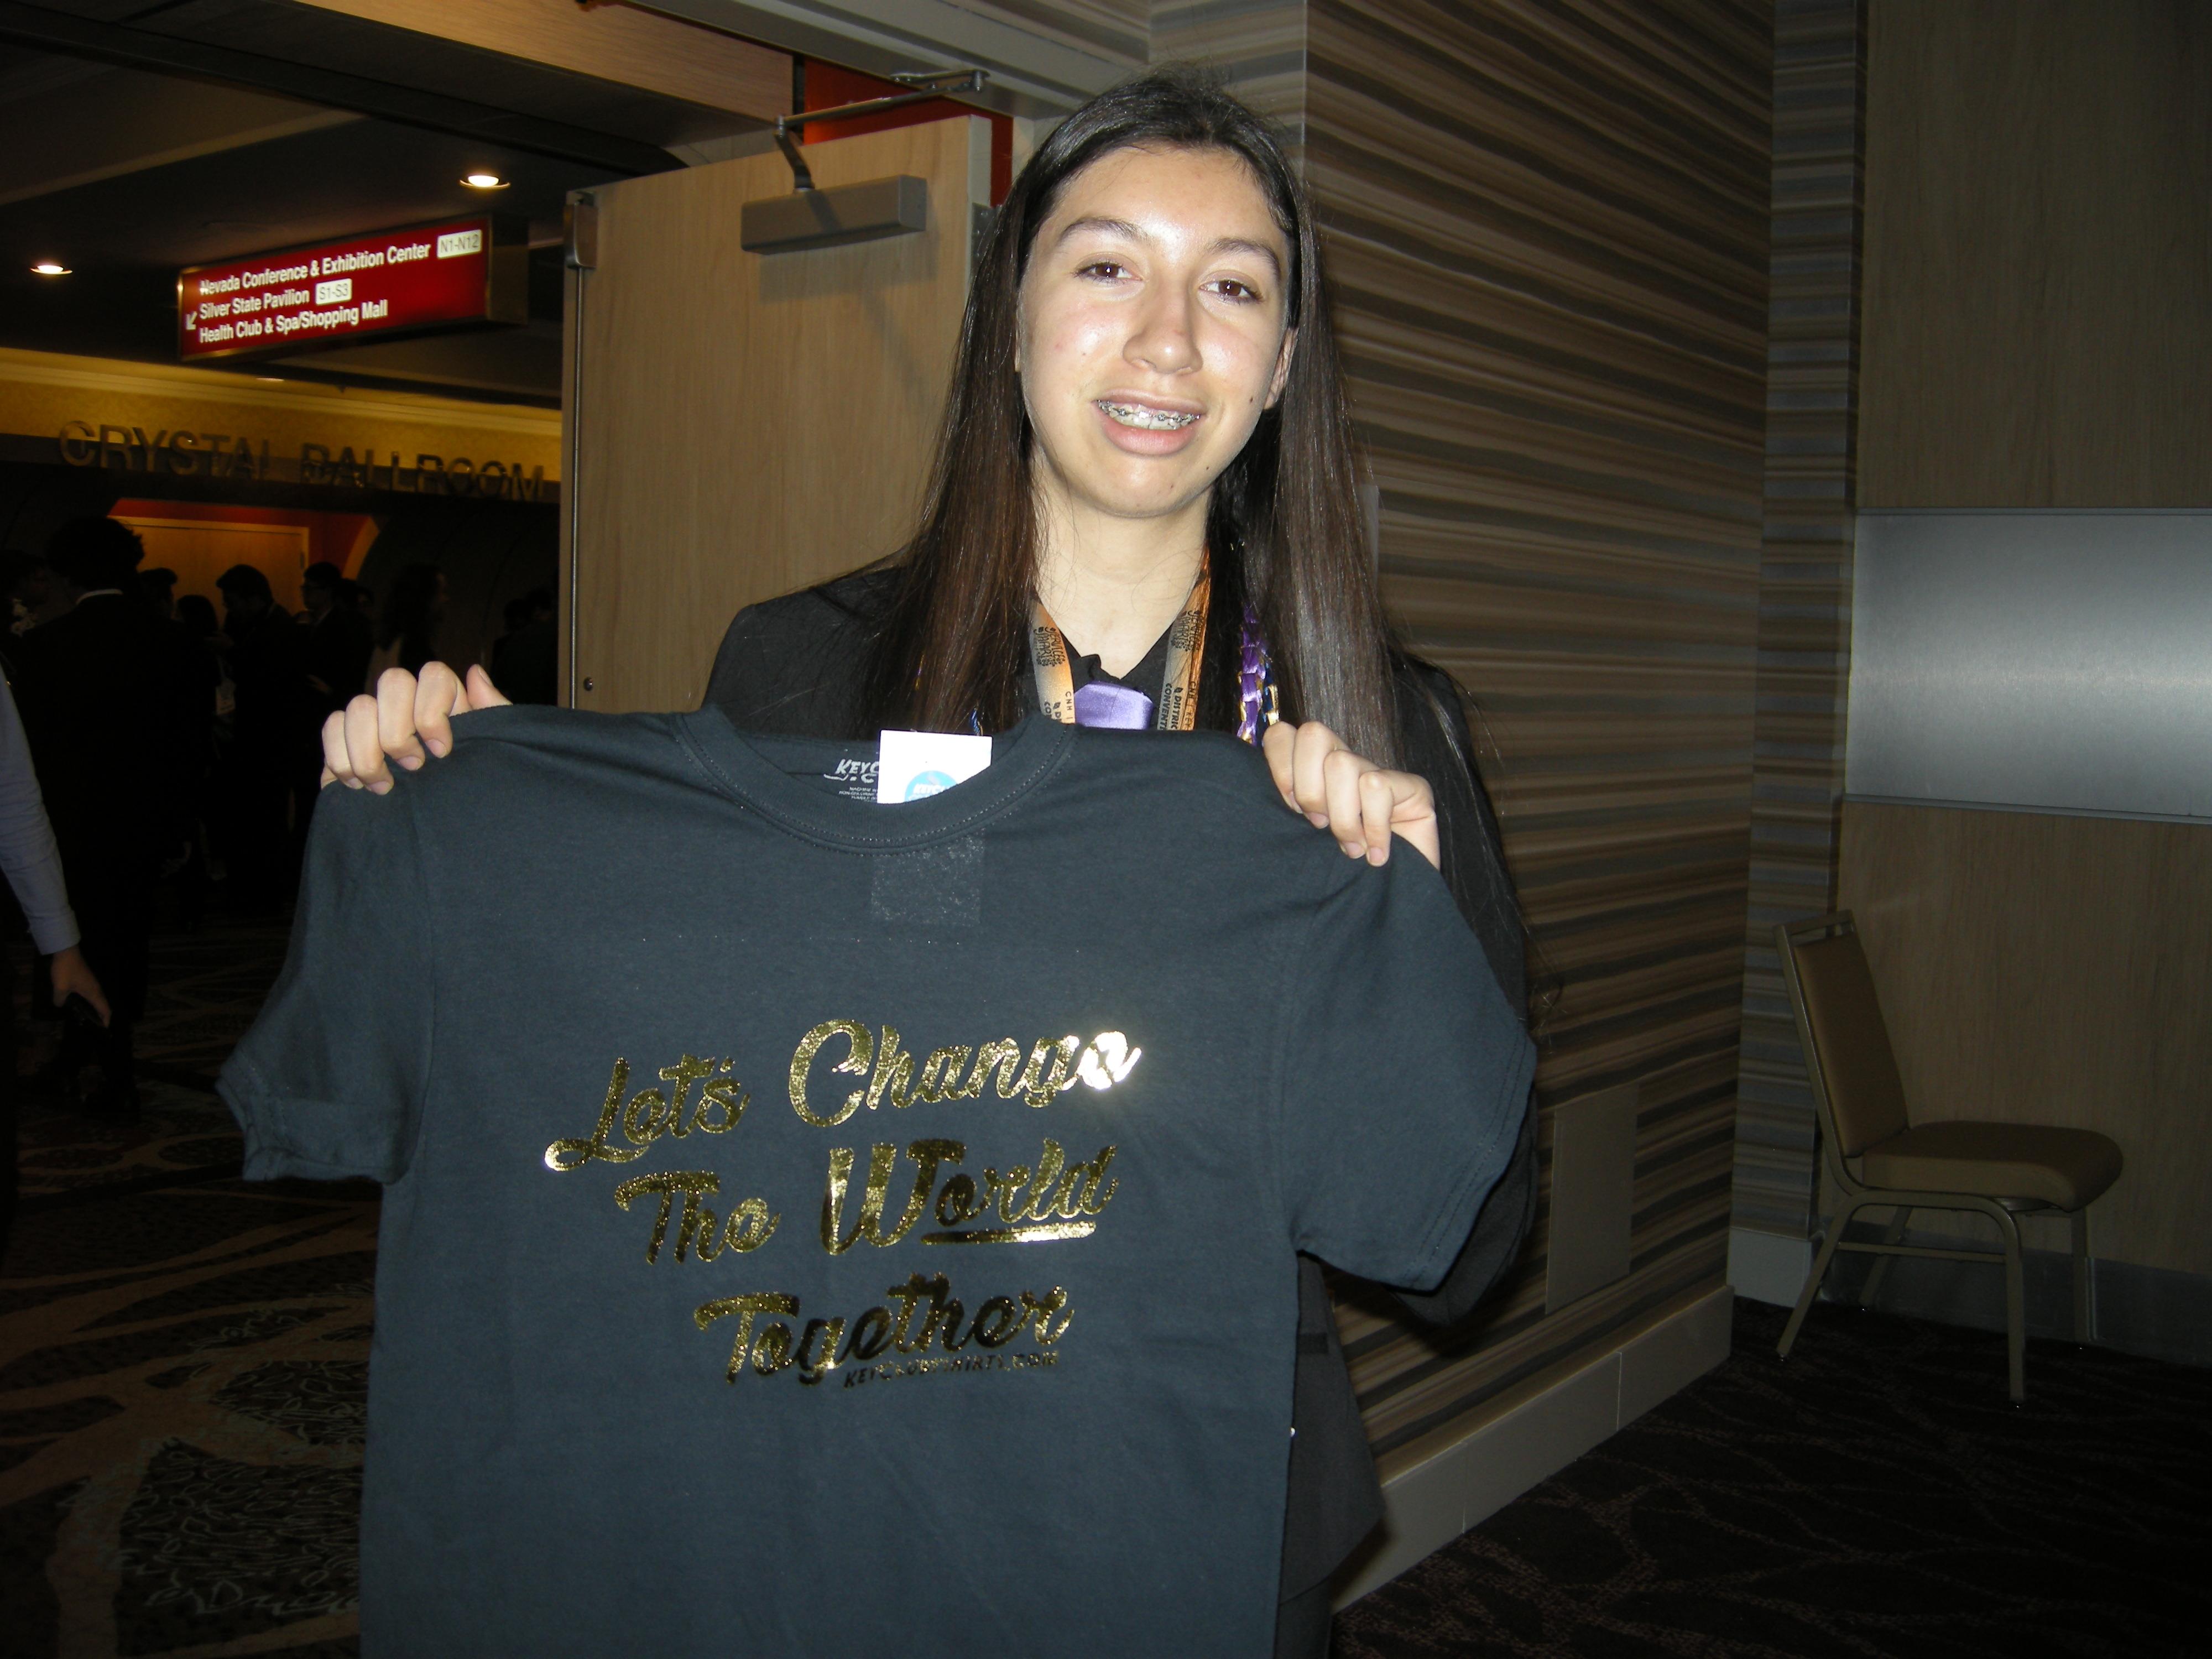 Anahi with new t-shirt